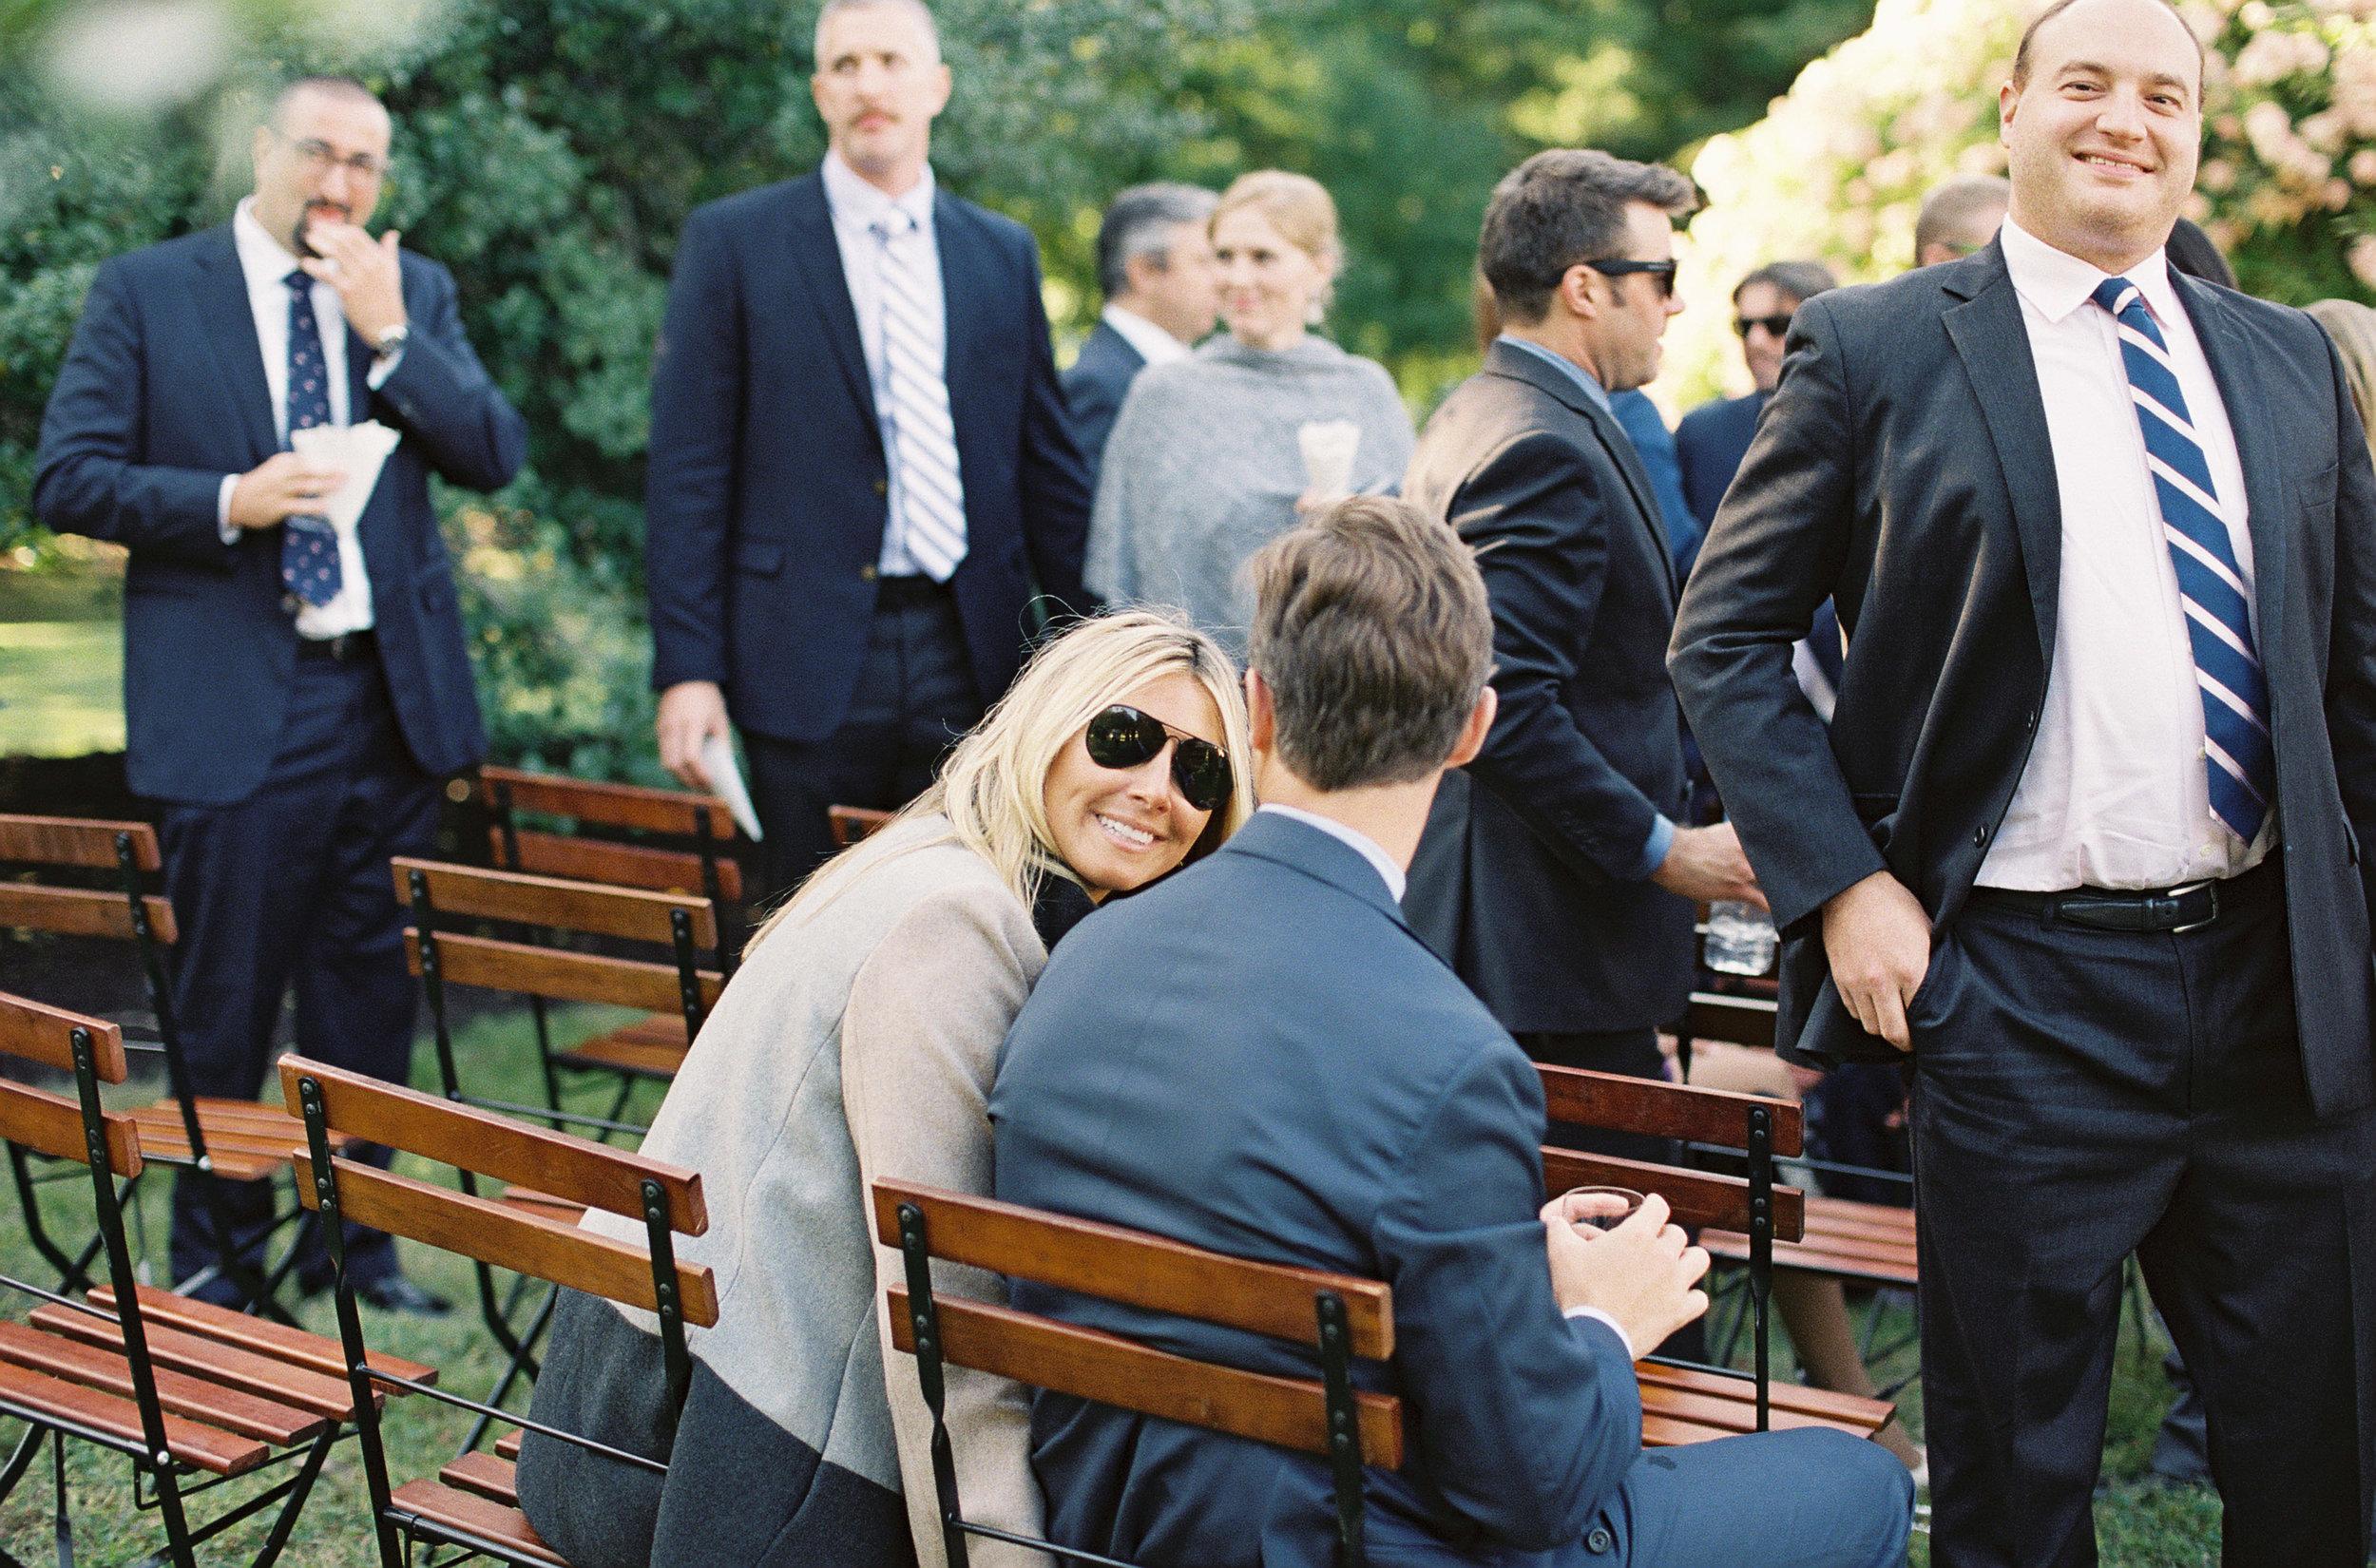 Connecticut-Wedding-30-Jen-Huang-20170909-KB-226-Jen_Huang-006798-R1-028.jpg